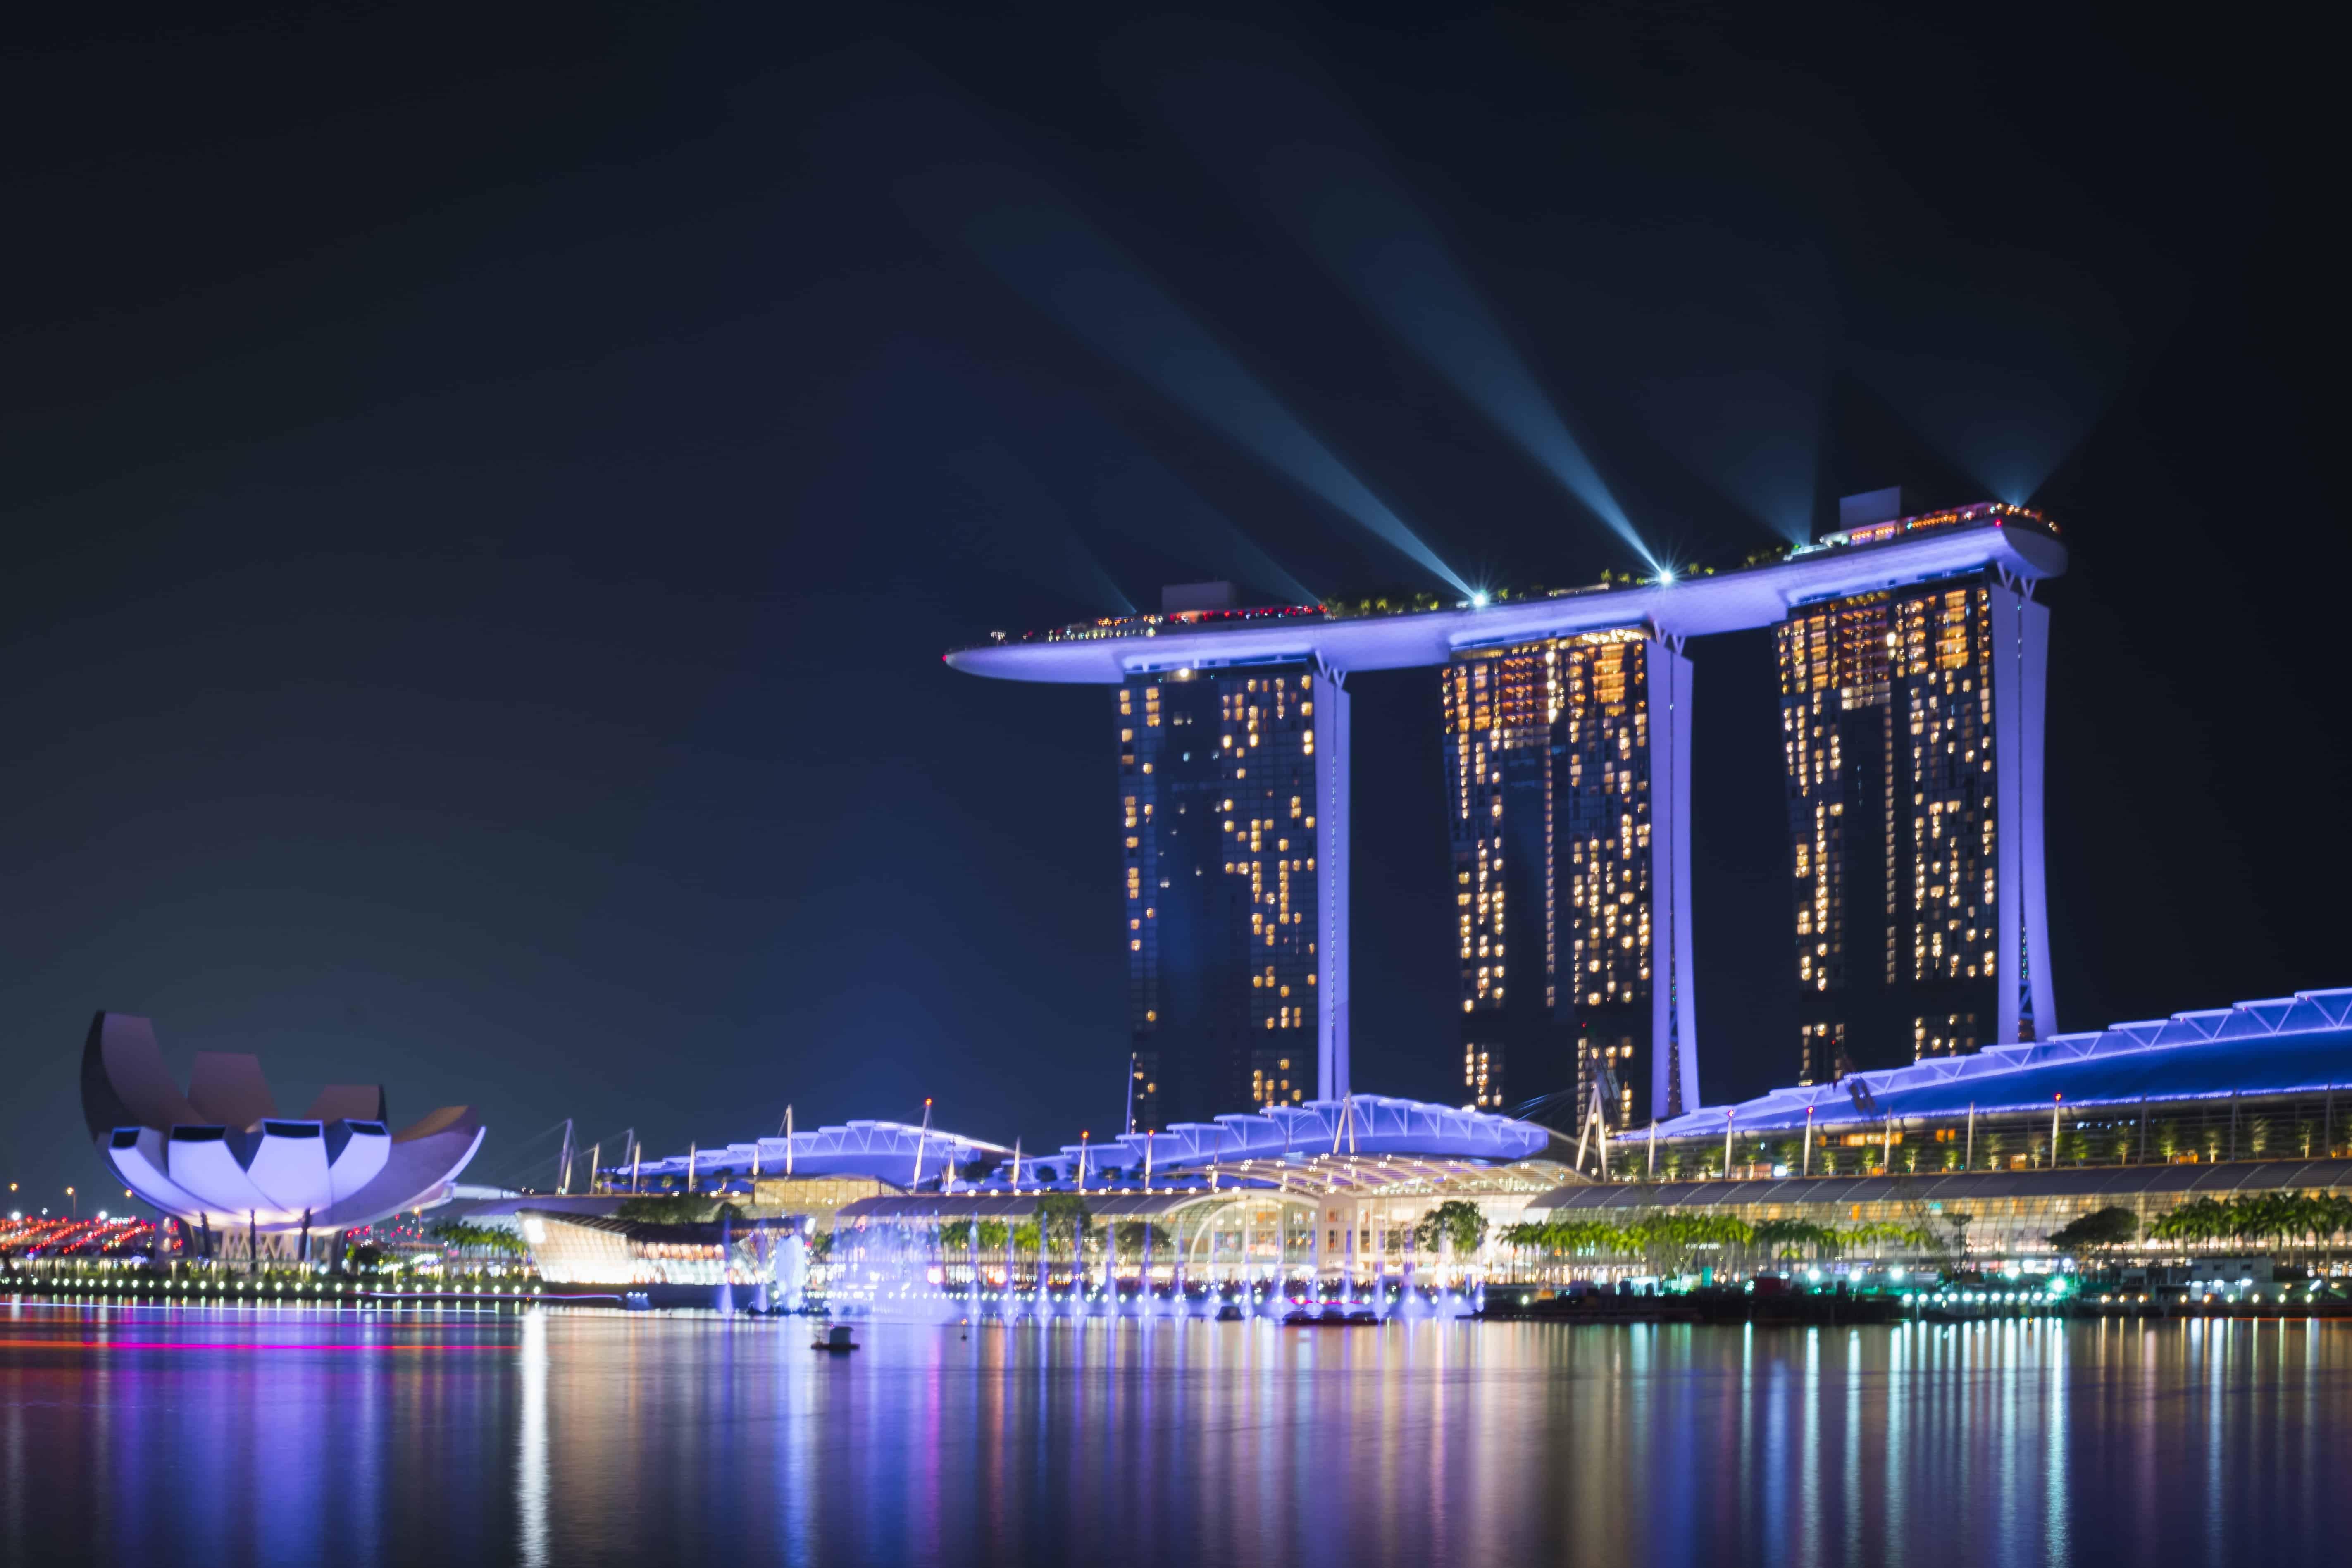 marina bay sands, singapore facts